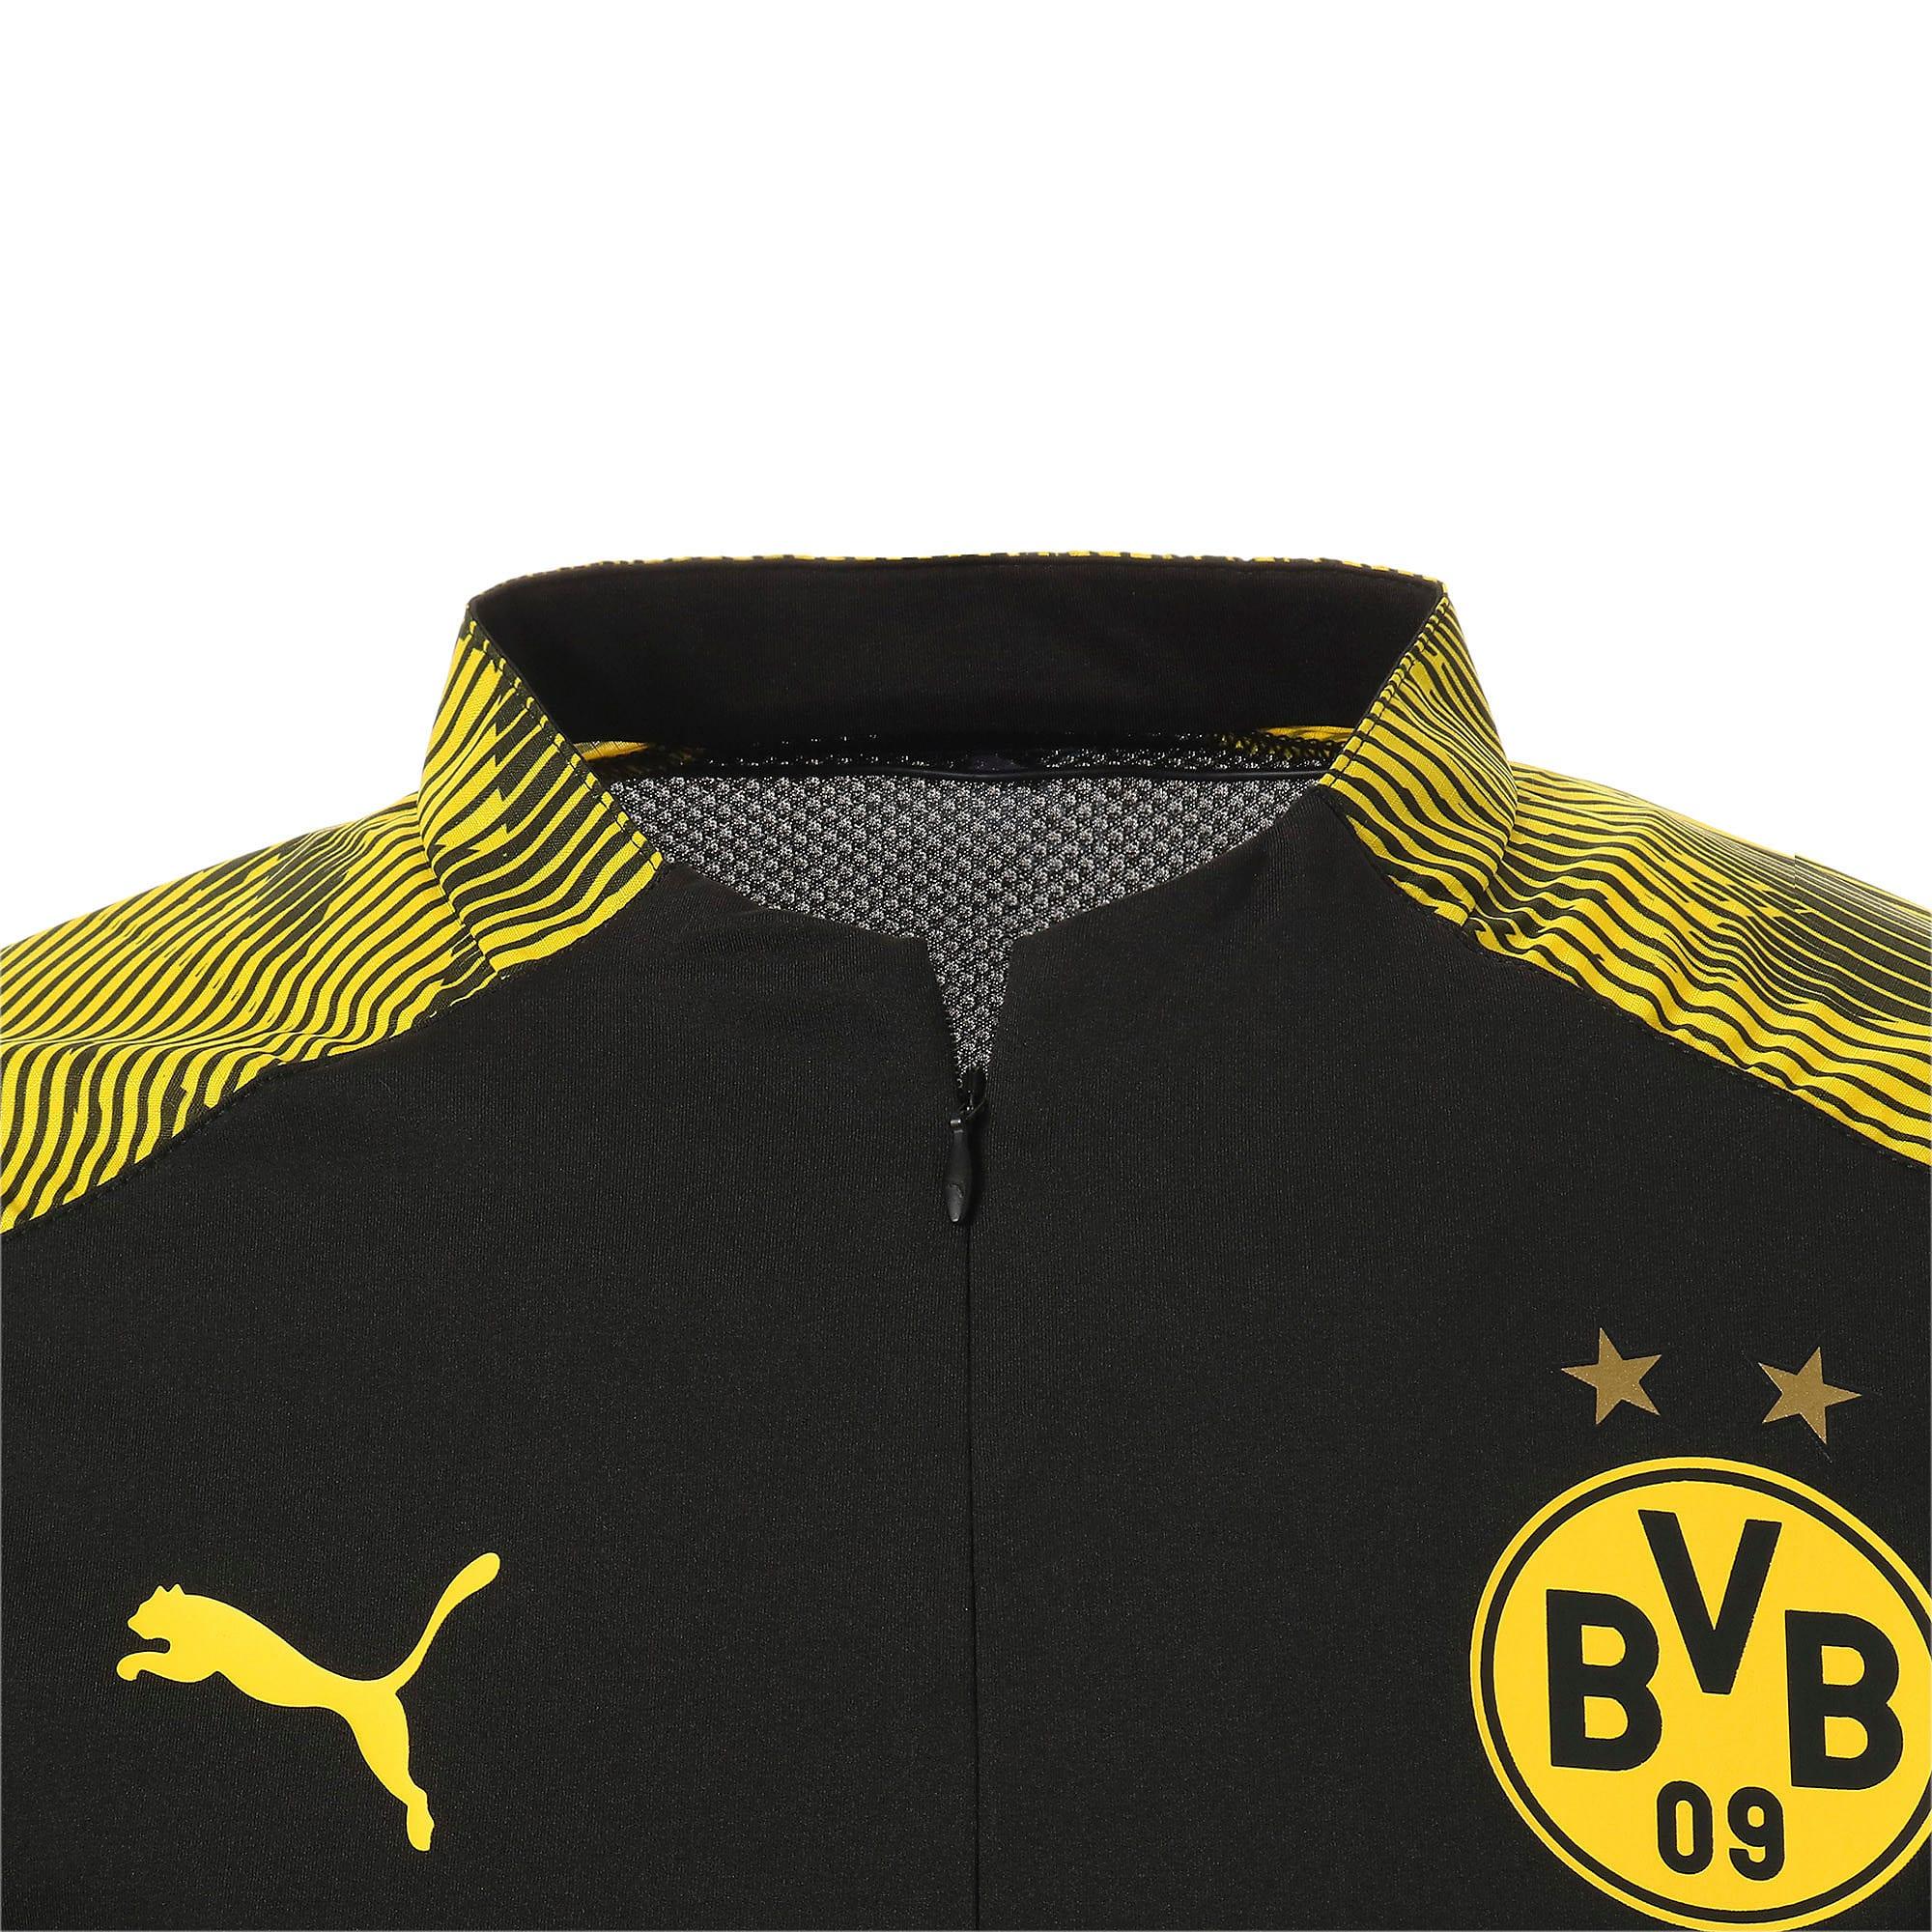 Thumbnail 10 of ドルトムント BVB 1/4 ジップ トレーニング トップ, Puma Black-Cyber Yellow, medium-JPN